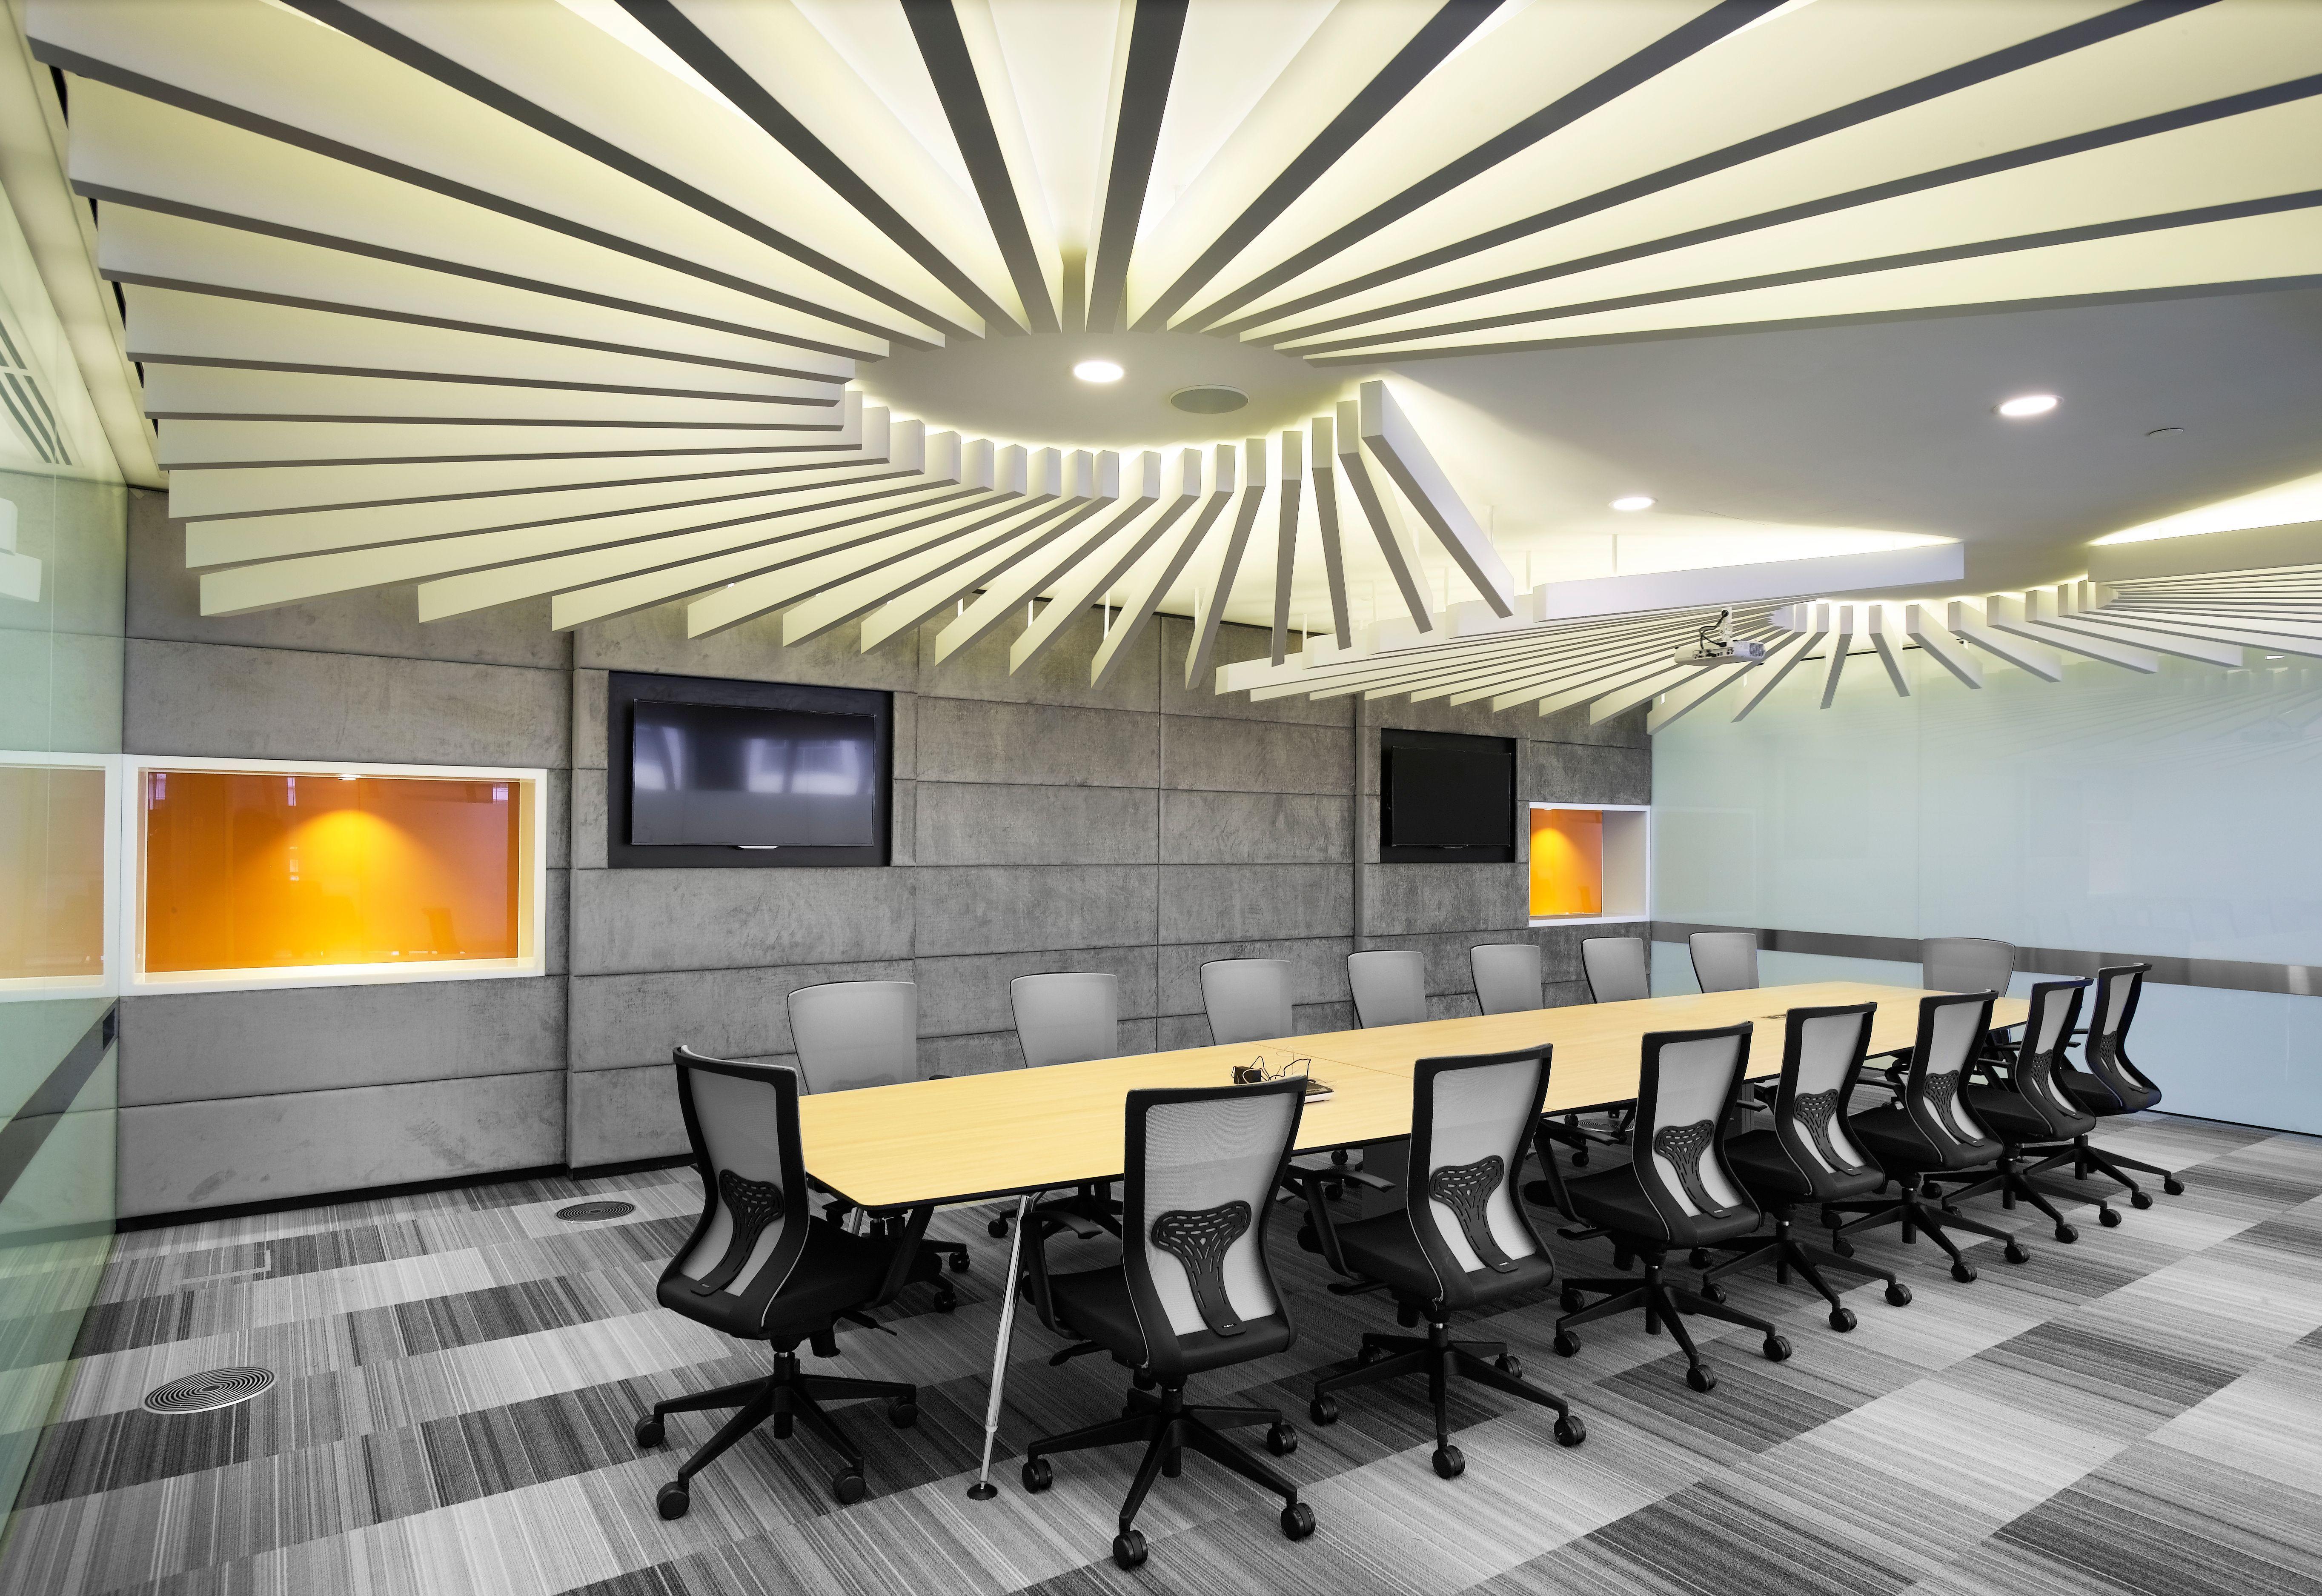 Amgeneral Insurance Berhad Kuala Lumpur Malaysia Office Interior Design By The Steven Leach Group The New Office Interior Design Interior Design Interior